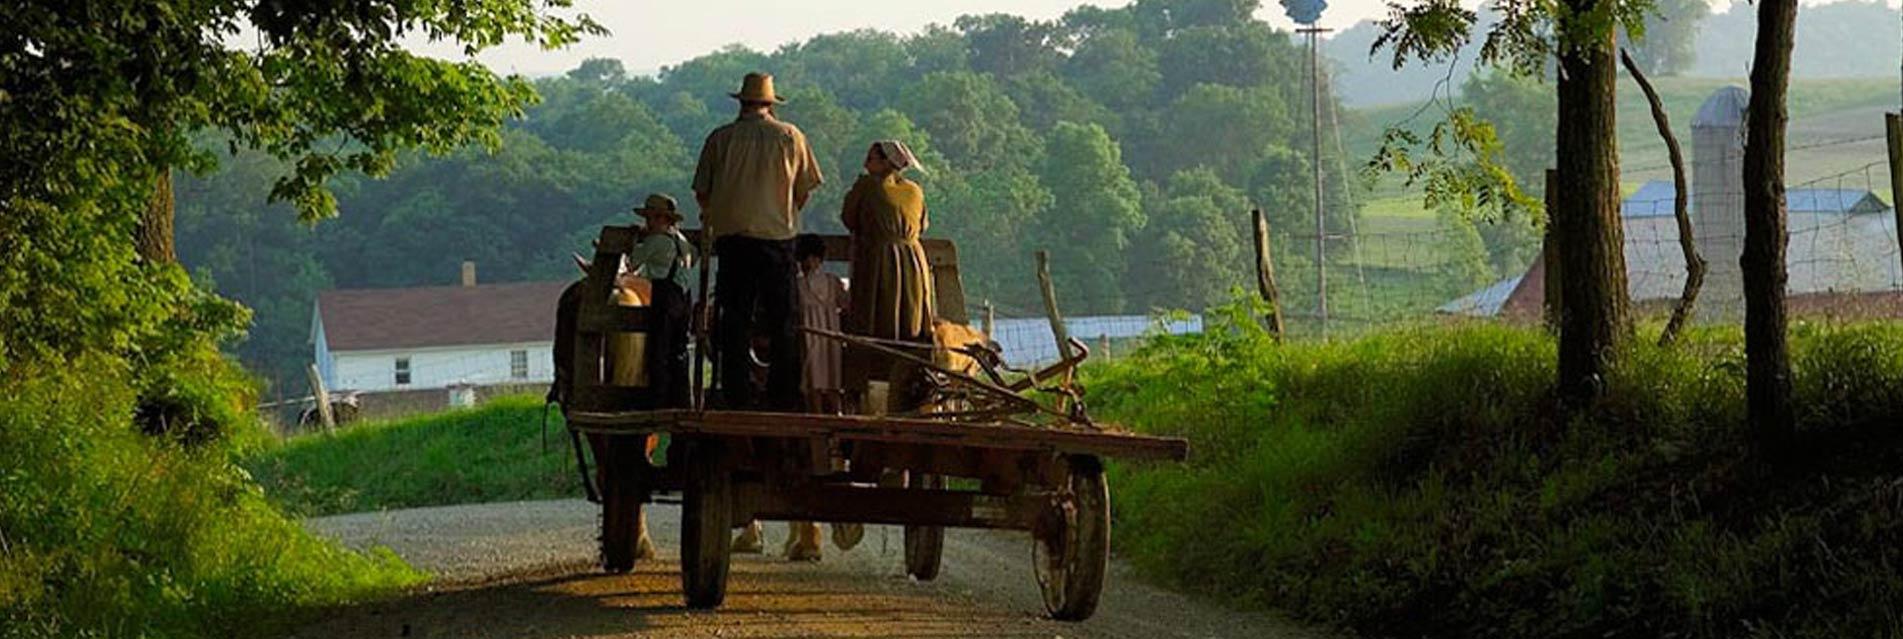 The Amish & Mennonite Heritage Center – Holmes County, Ohio